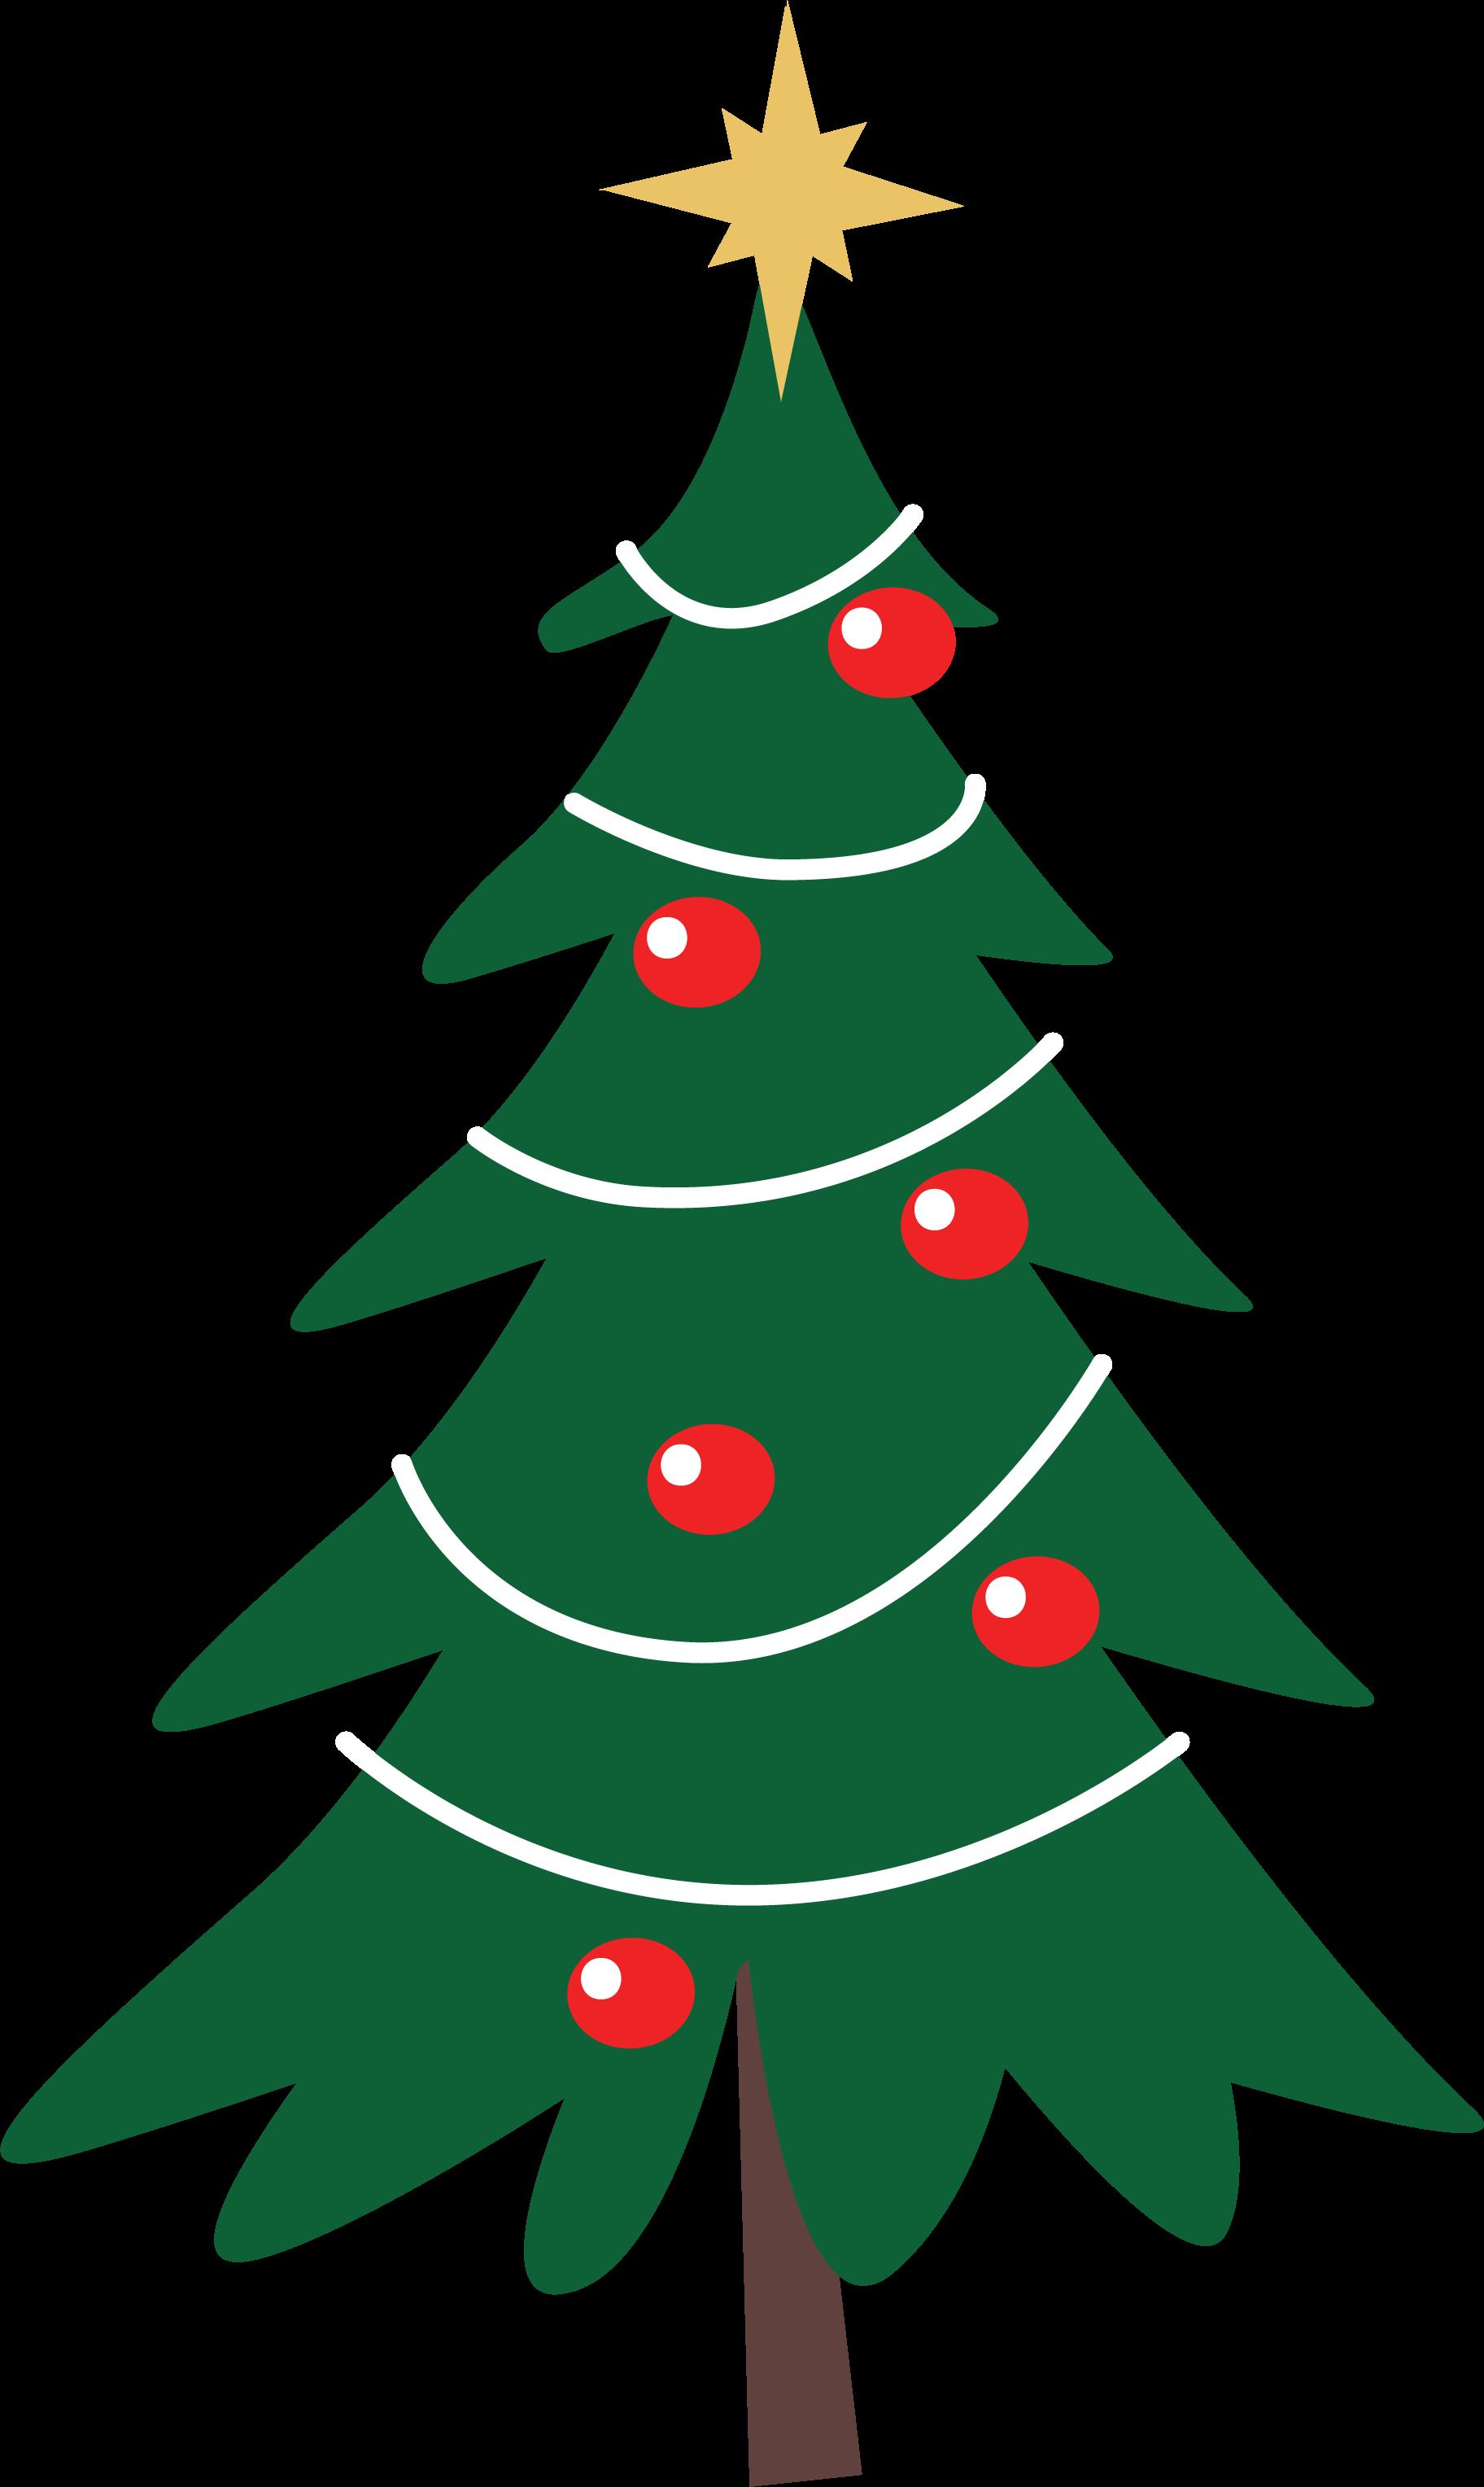 Merry Christmas Christmas Tree SVG Cut File